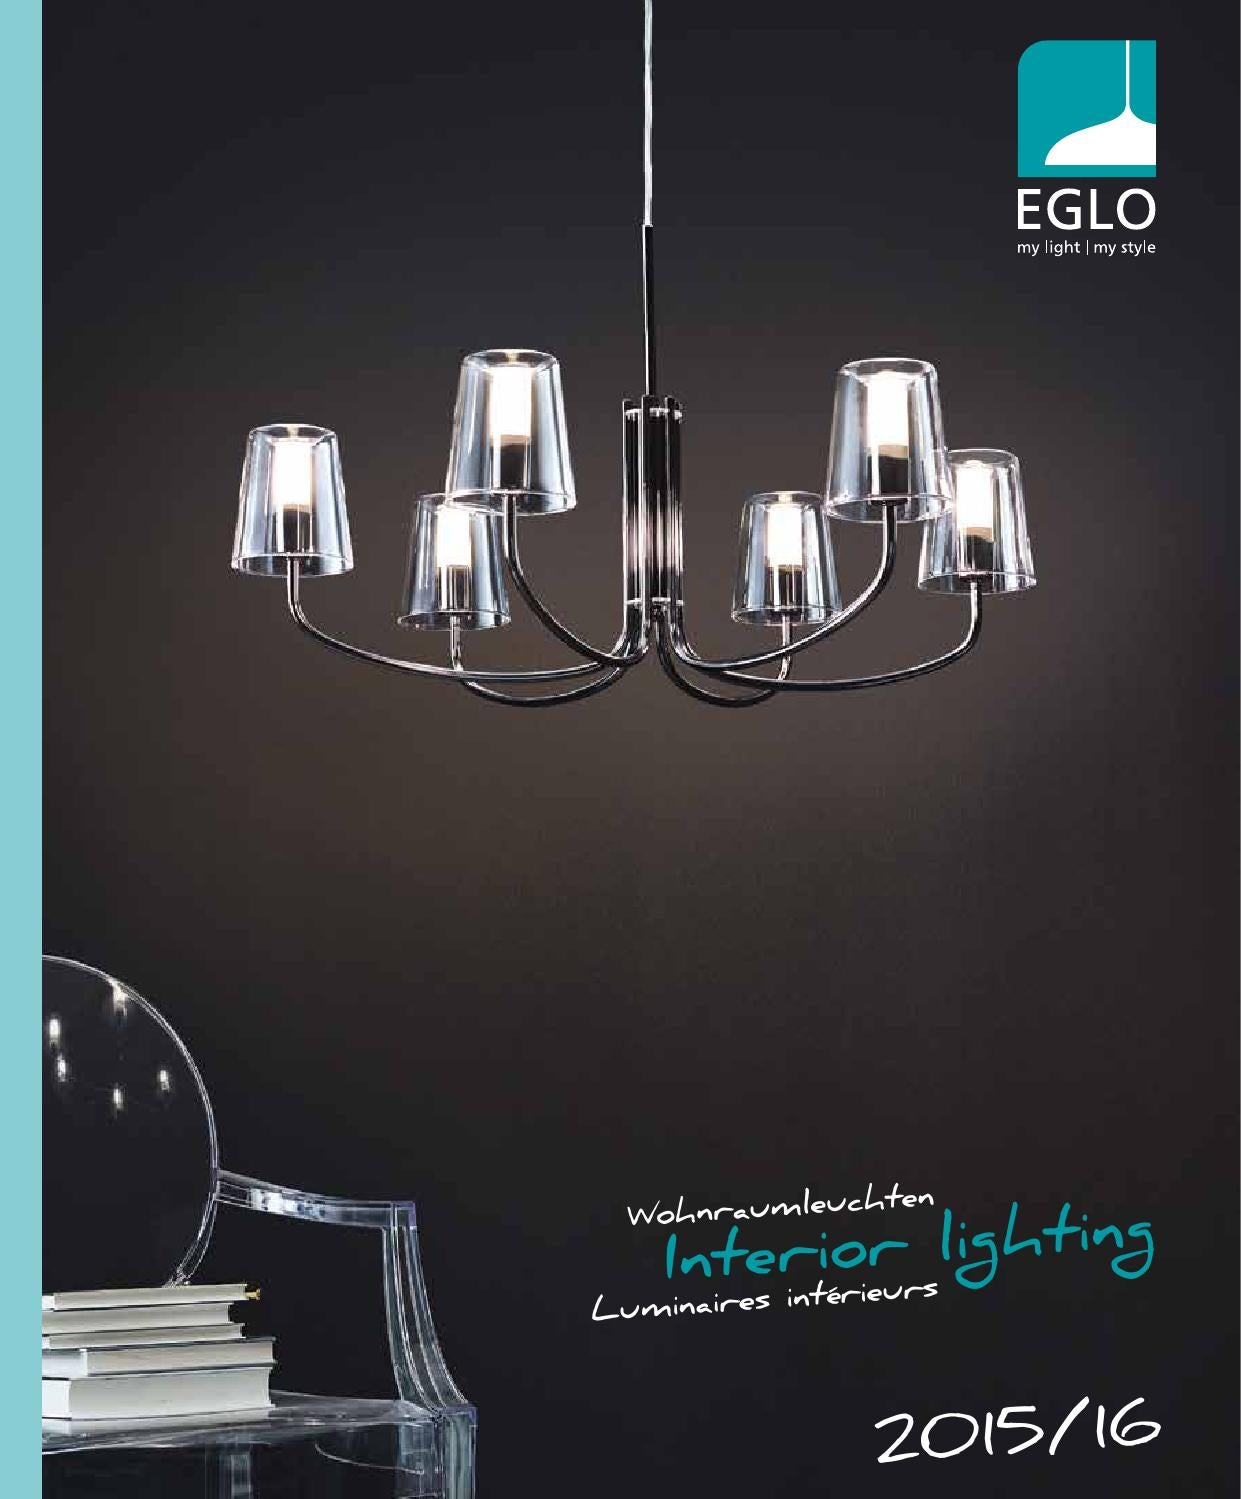 Eglo interior lighting 2015 16 part1 by .ua issuu